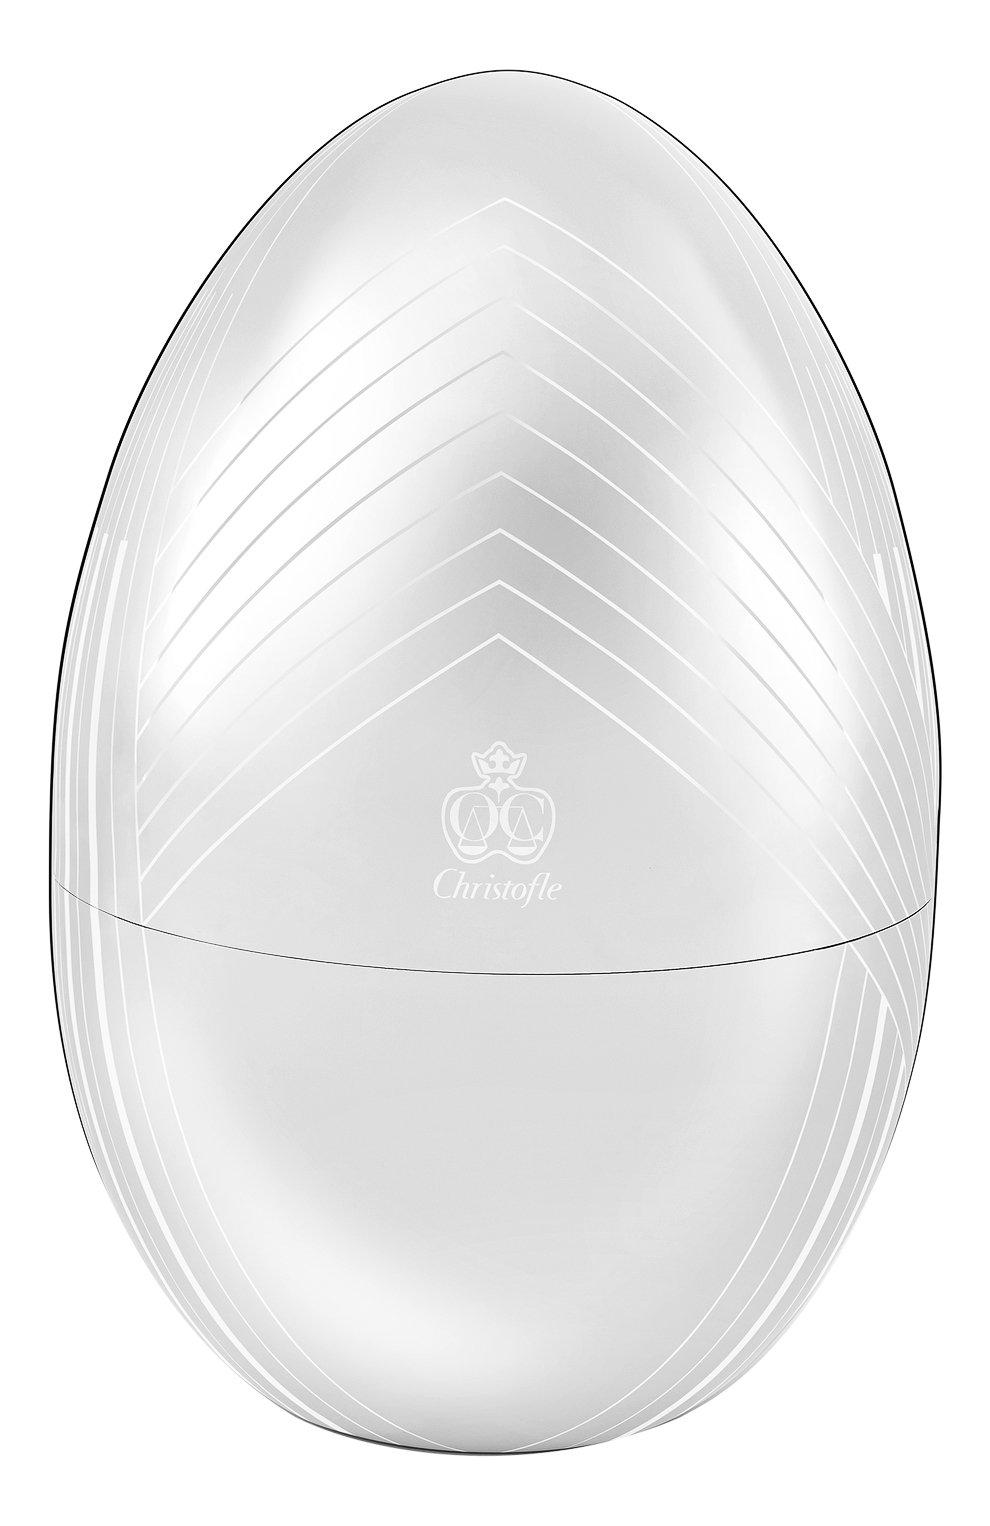 Набор столовых приборов на 6 персон mood egg karl lagerfeld CHRISTOFLE серебряного цвета, арт. 00066299   Фото 1